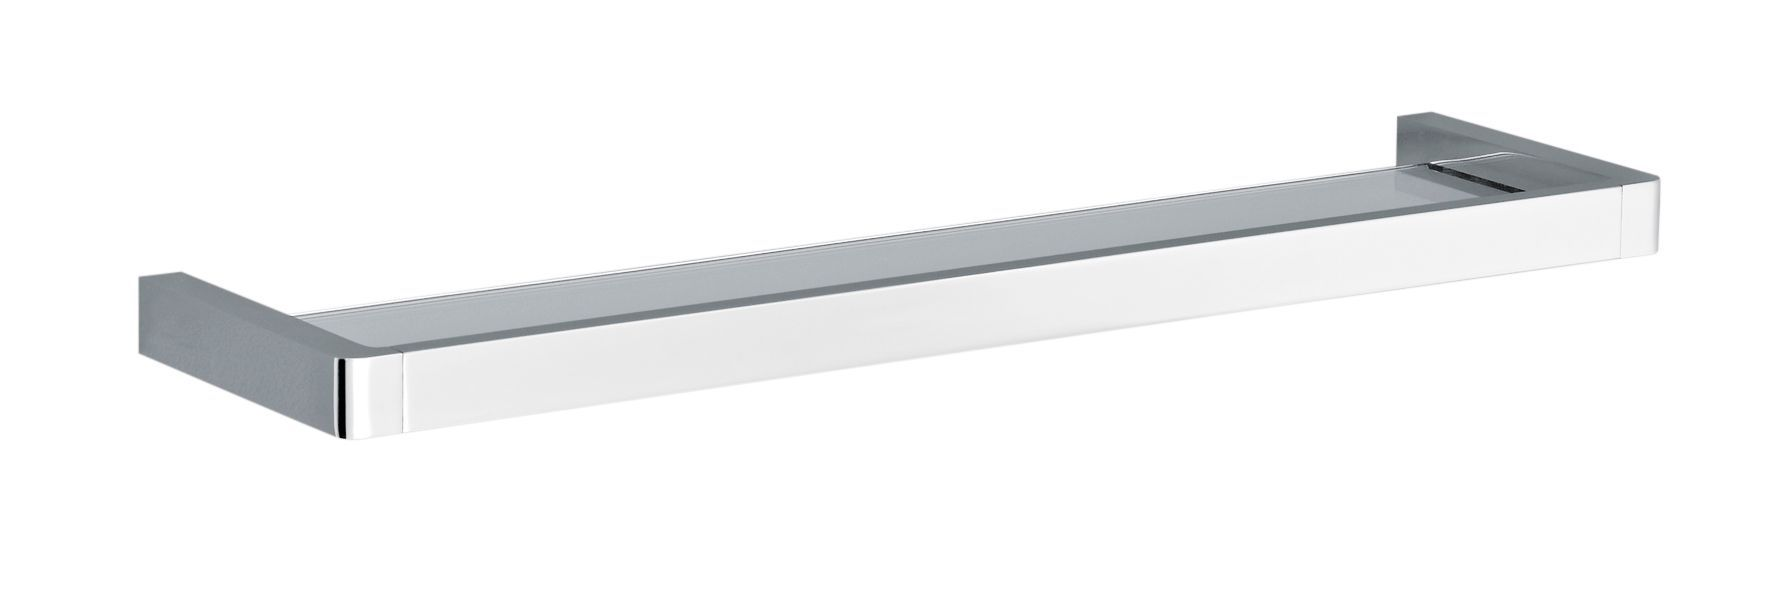 Streamline Chrome Effect Shelf (l)504mm (d)130mm